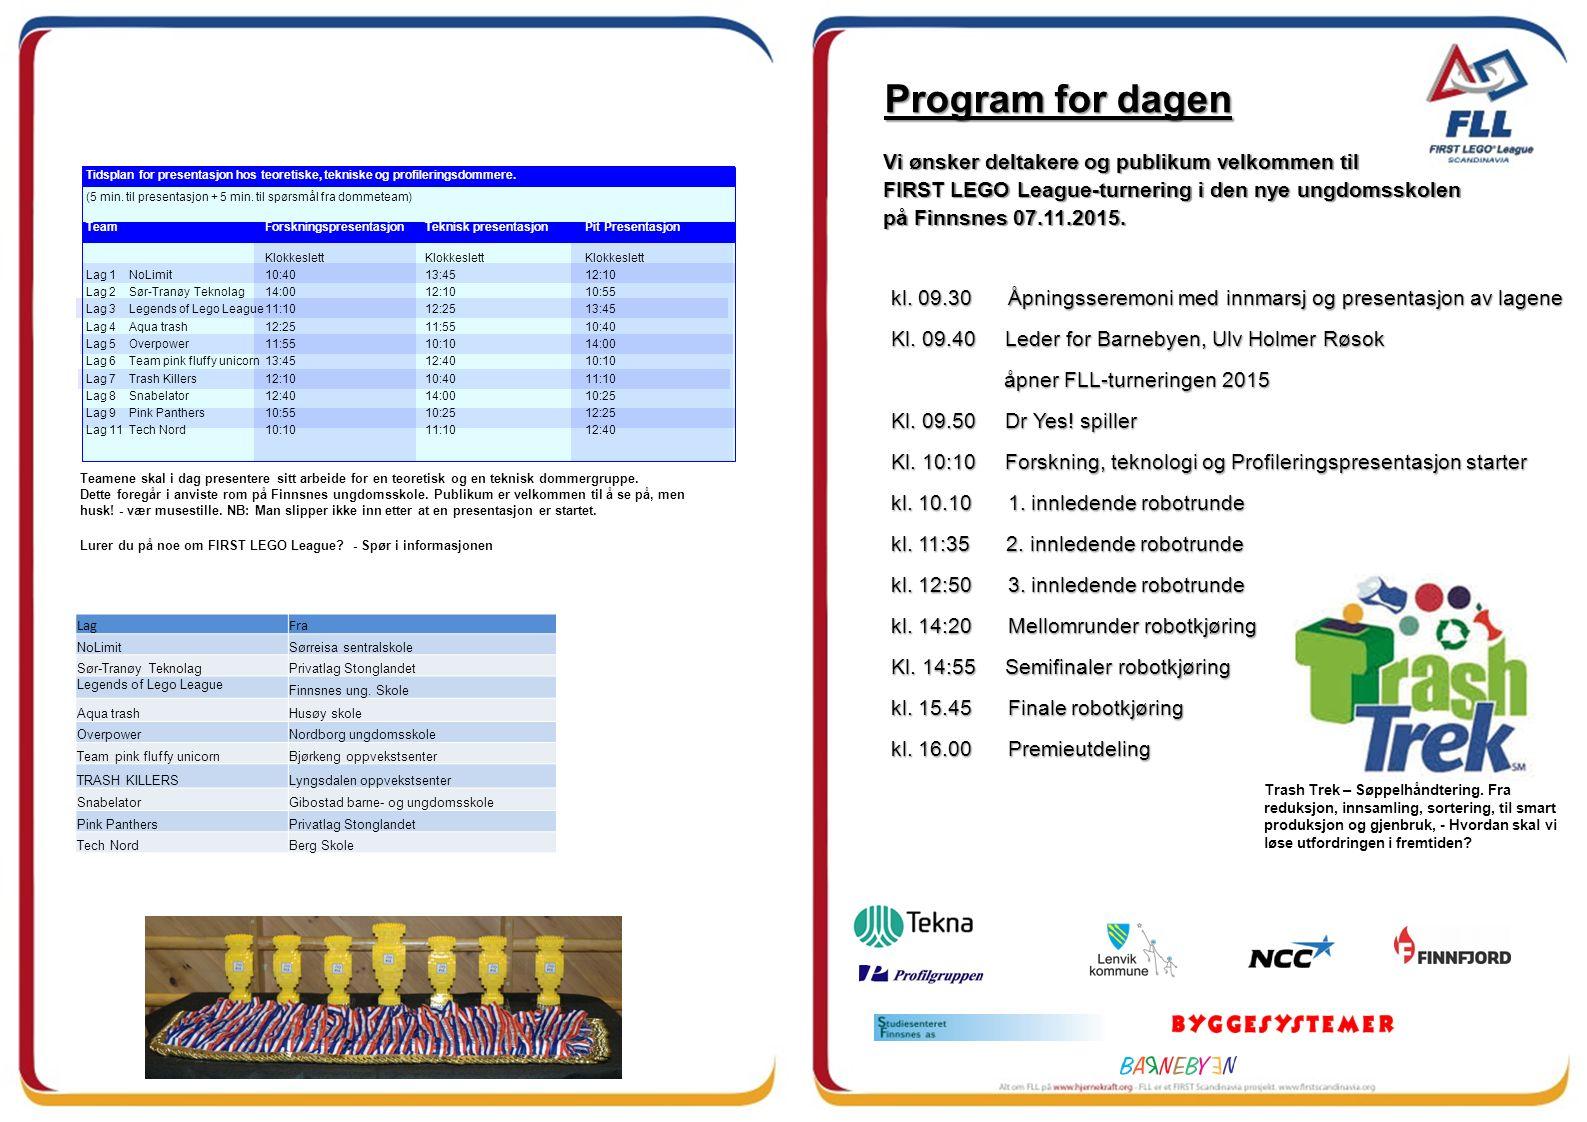 Vi ønsker deltakere og publikum velkommen til FIRST LEGO League-turnering i den nye ungdomsskolen på Finnsnes 07.11.2015.